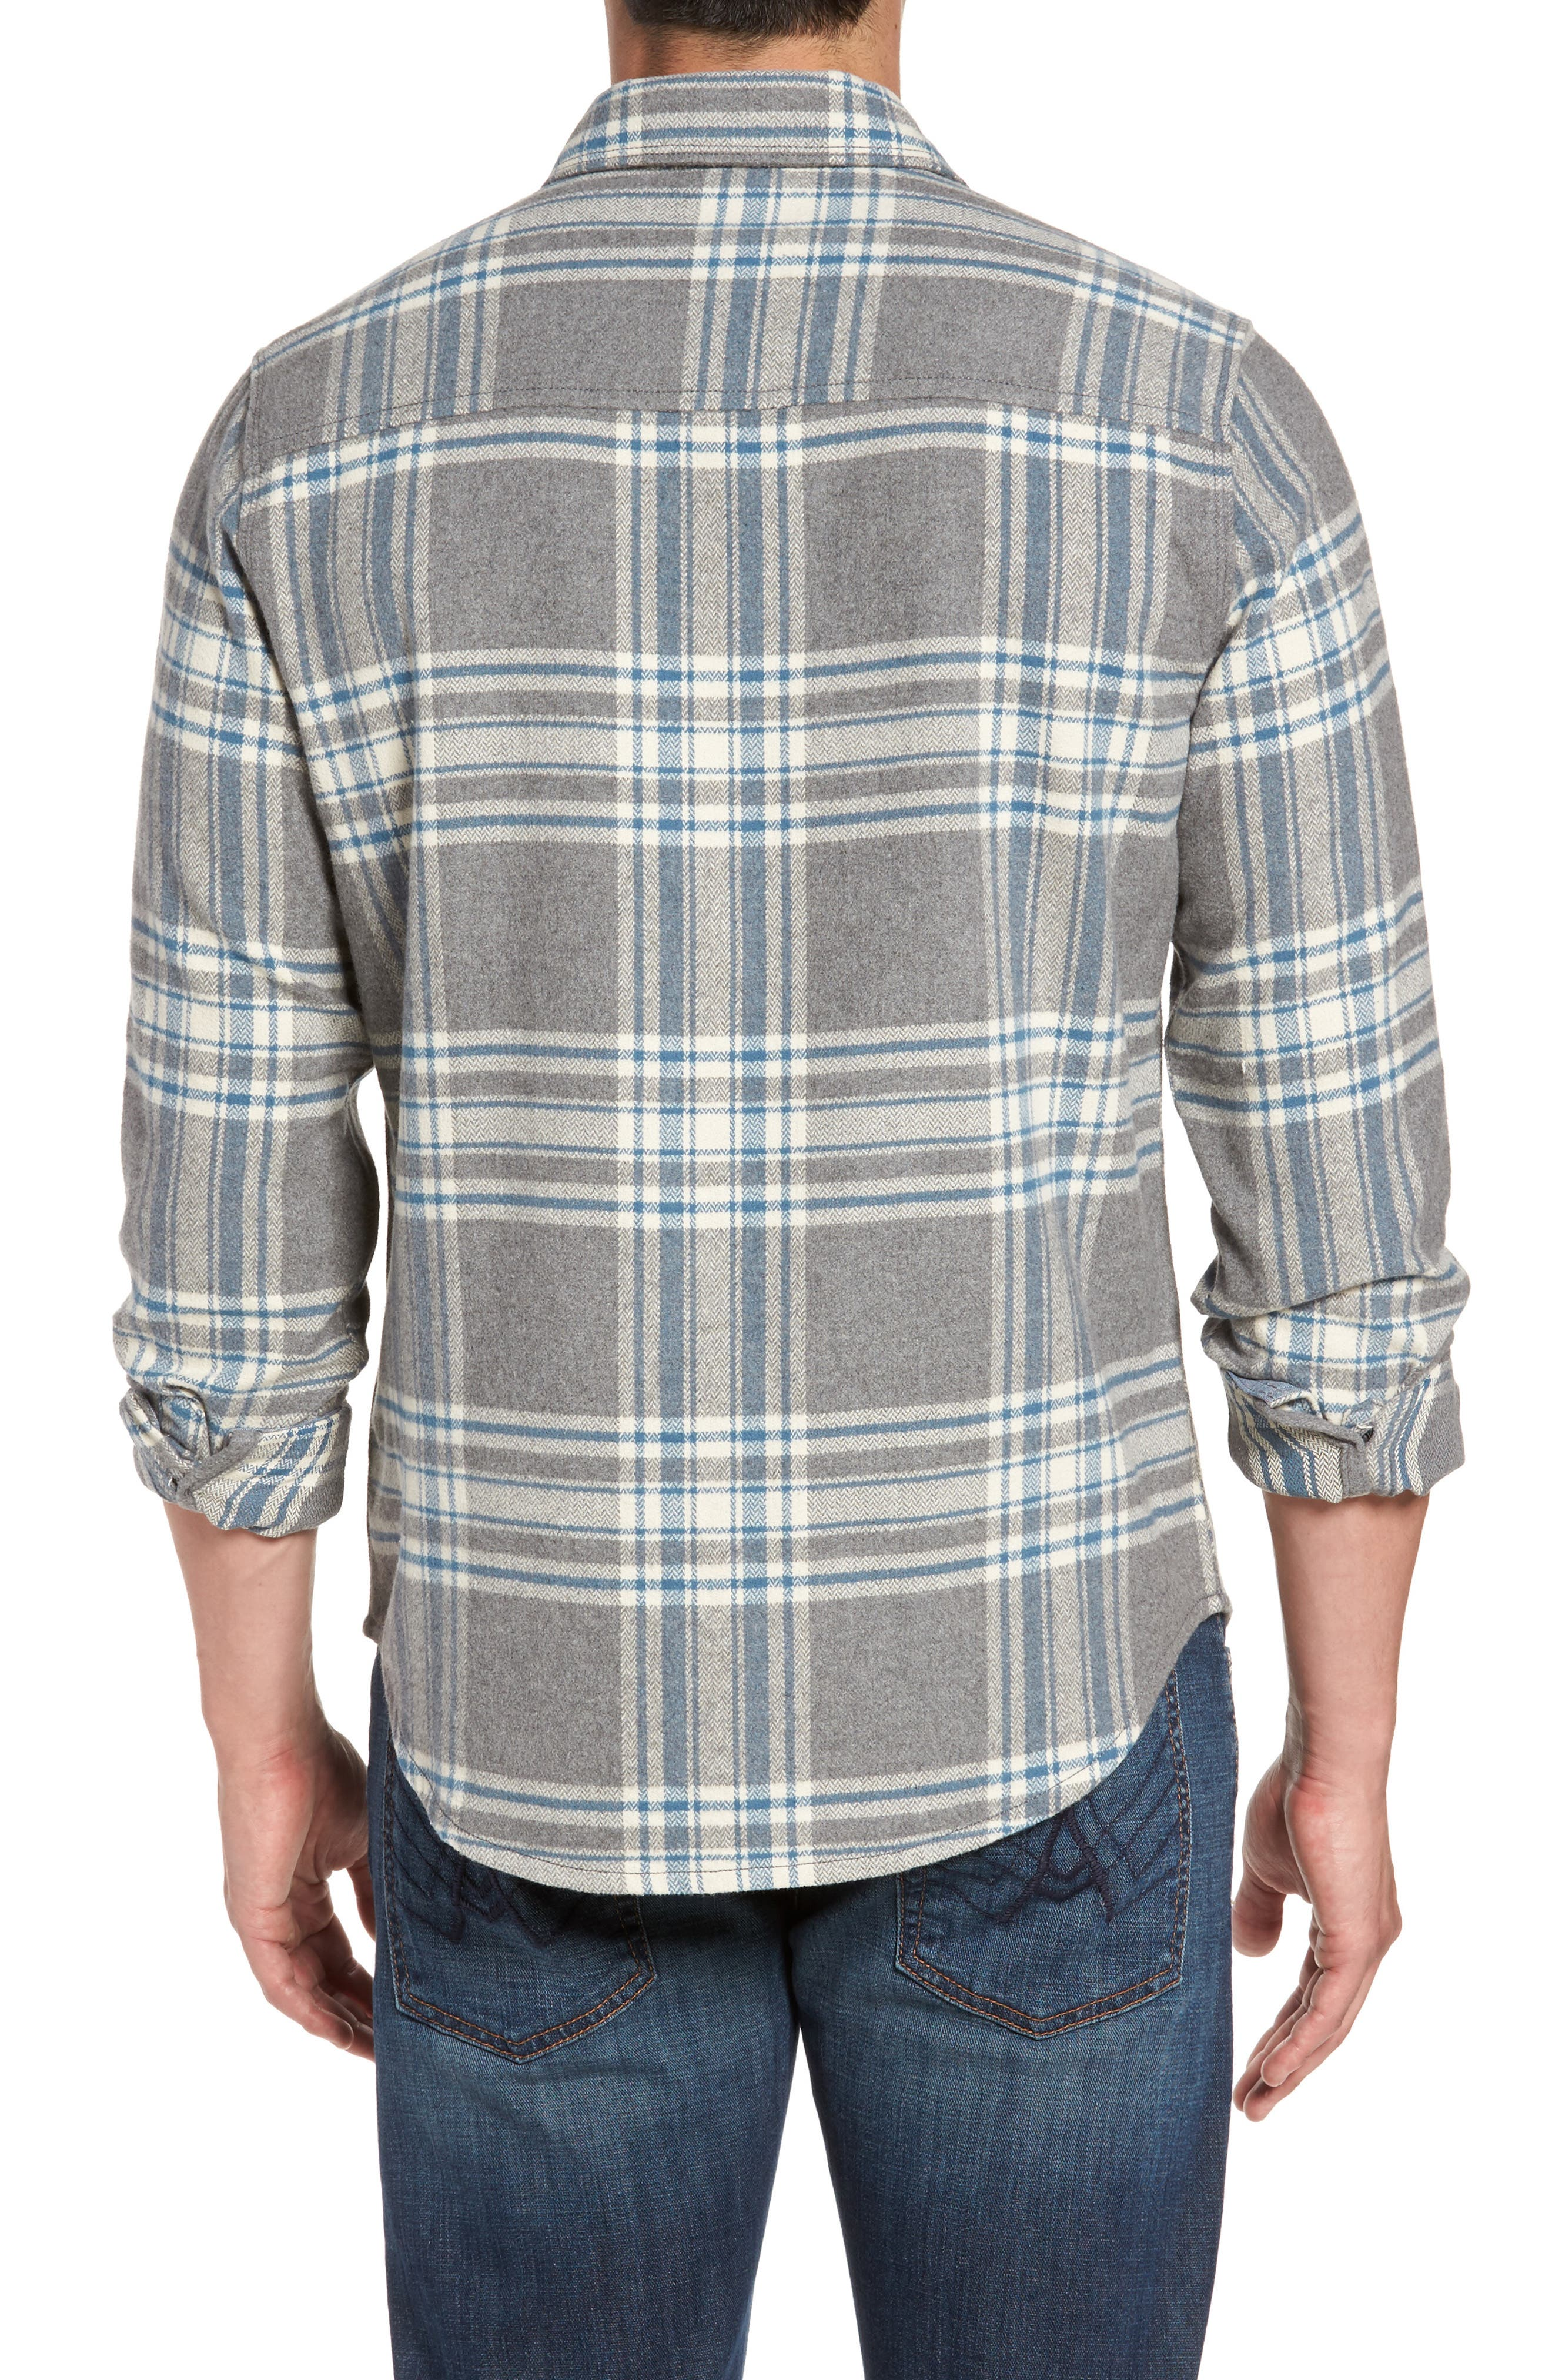 Marin Herringbone Plaid Flannel Shirt,                             Alternate thumbnail 2, color,                             035